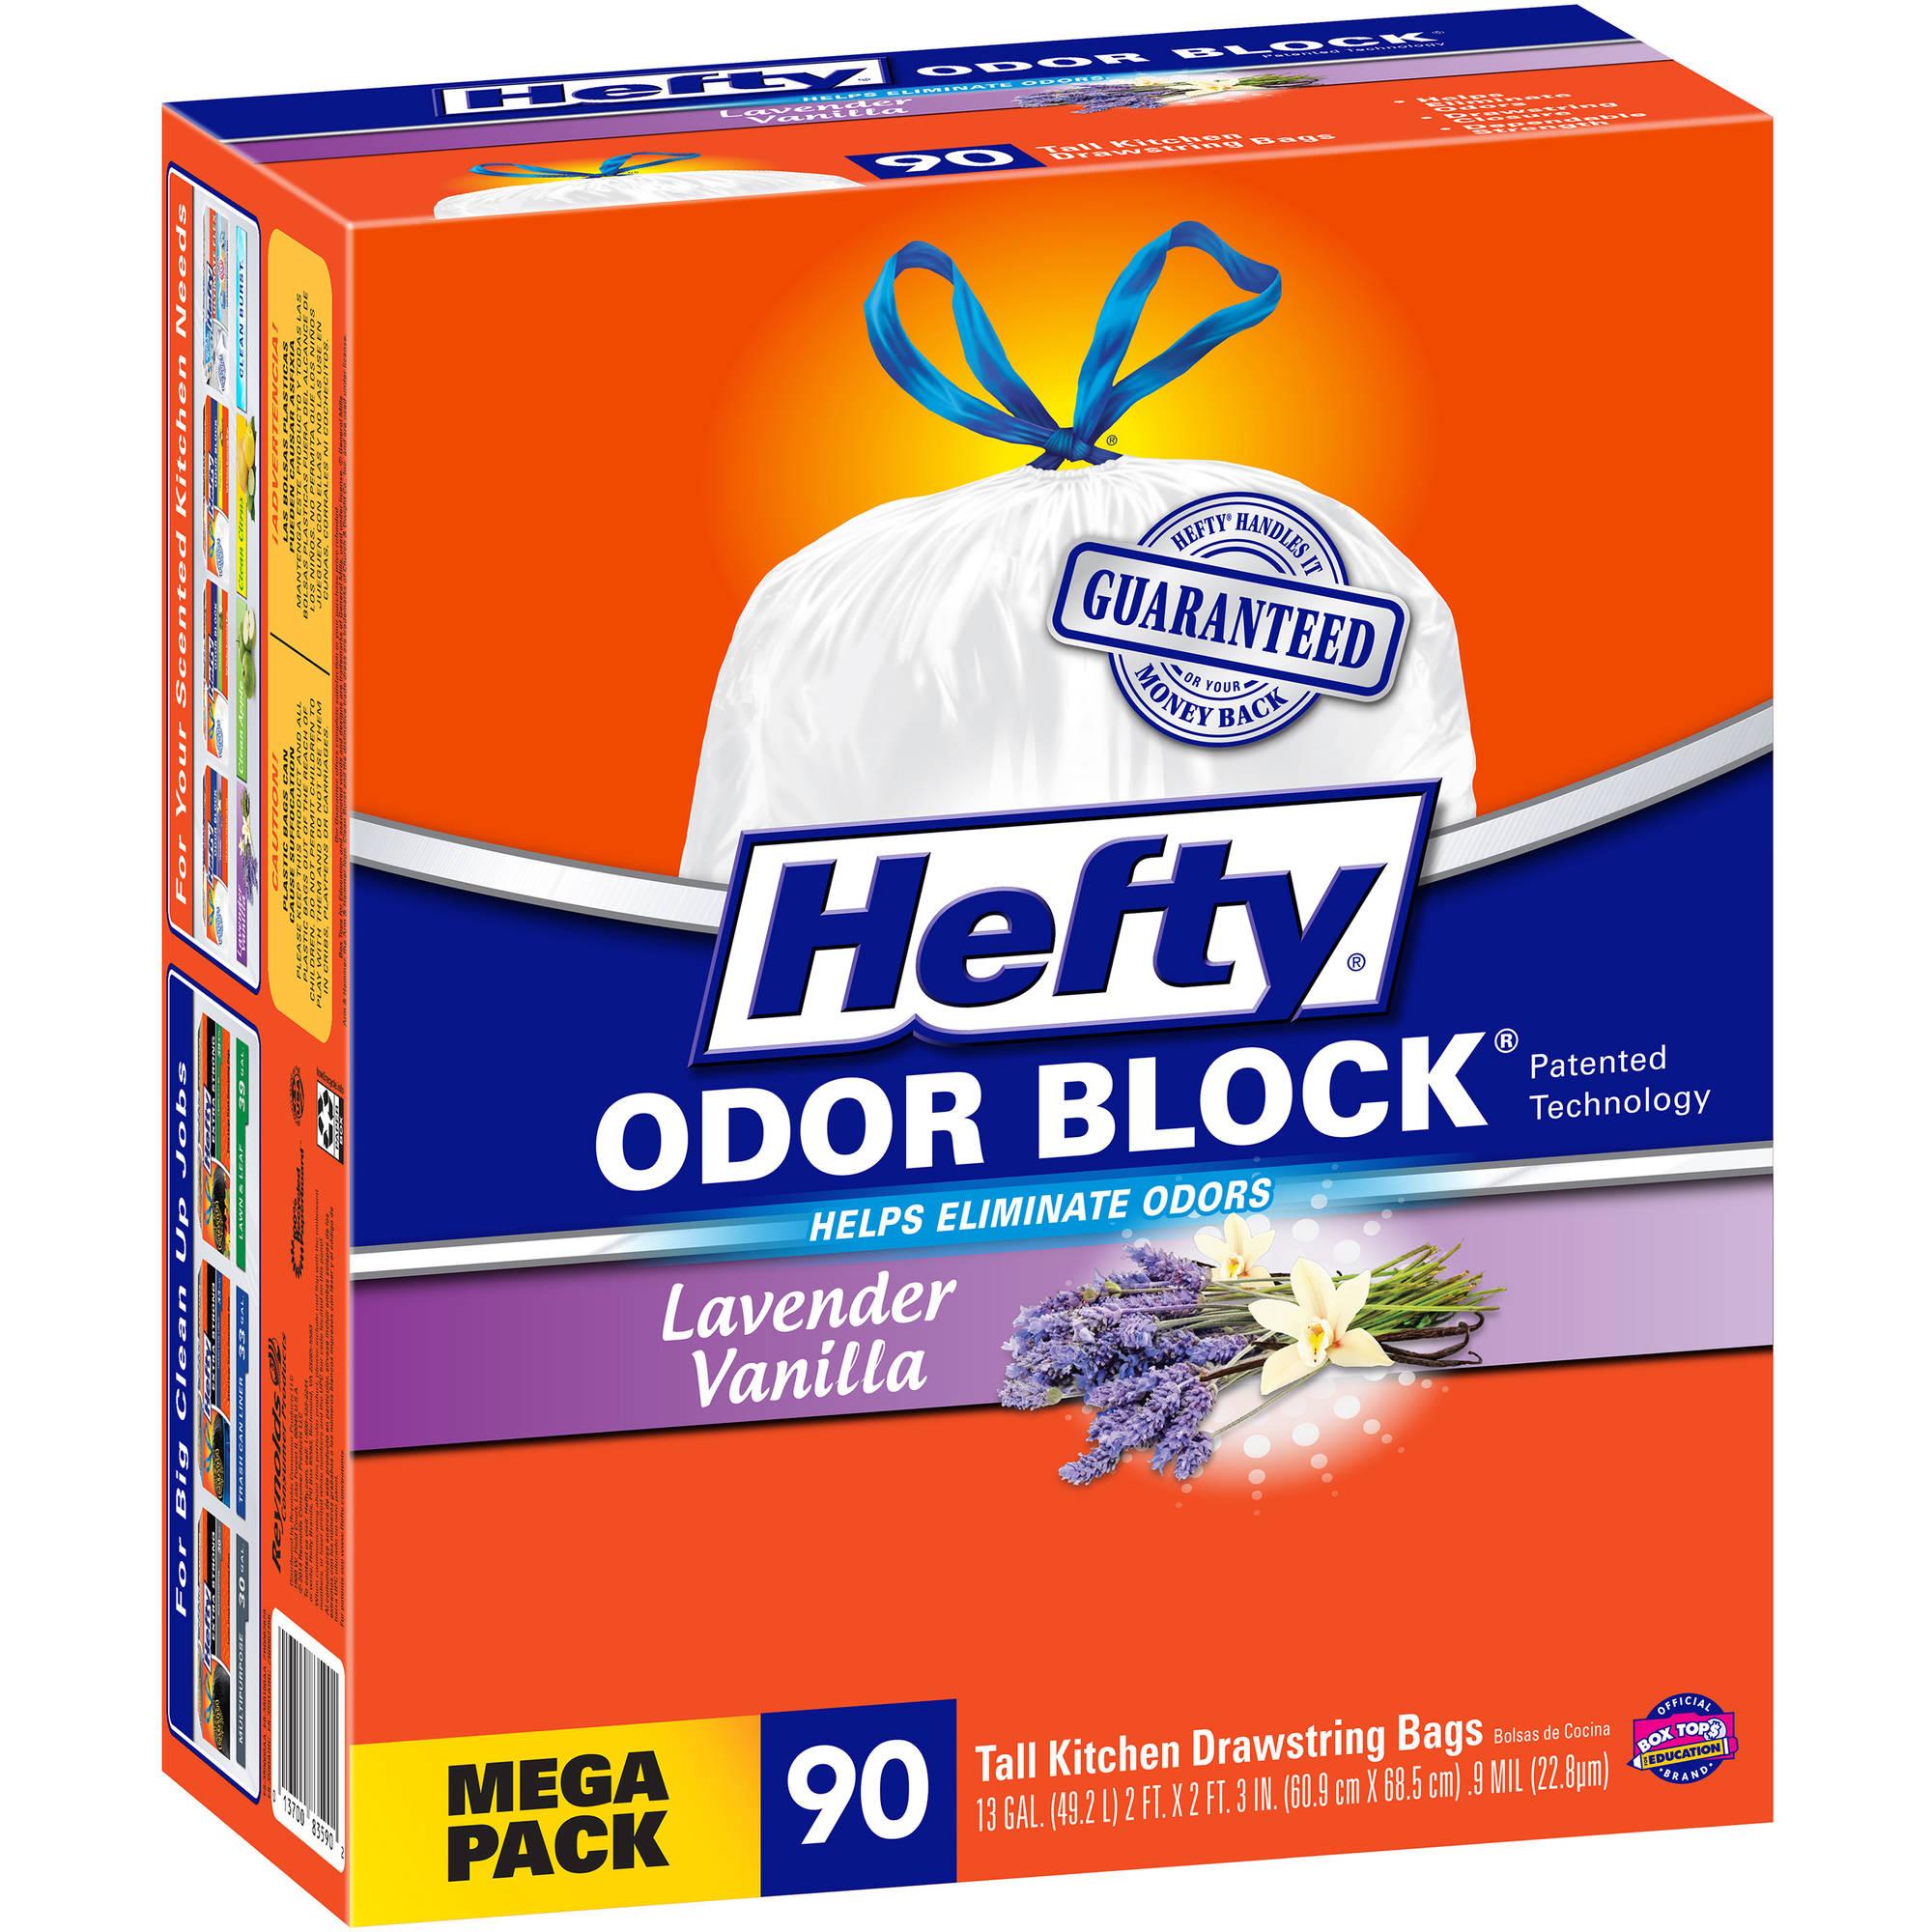 Hefty Odor Block Lavender Vanilla Tall Kitchen Drawstring Bags, 13 gallon, 90 count